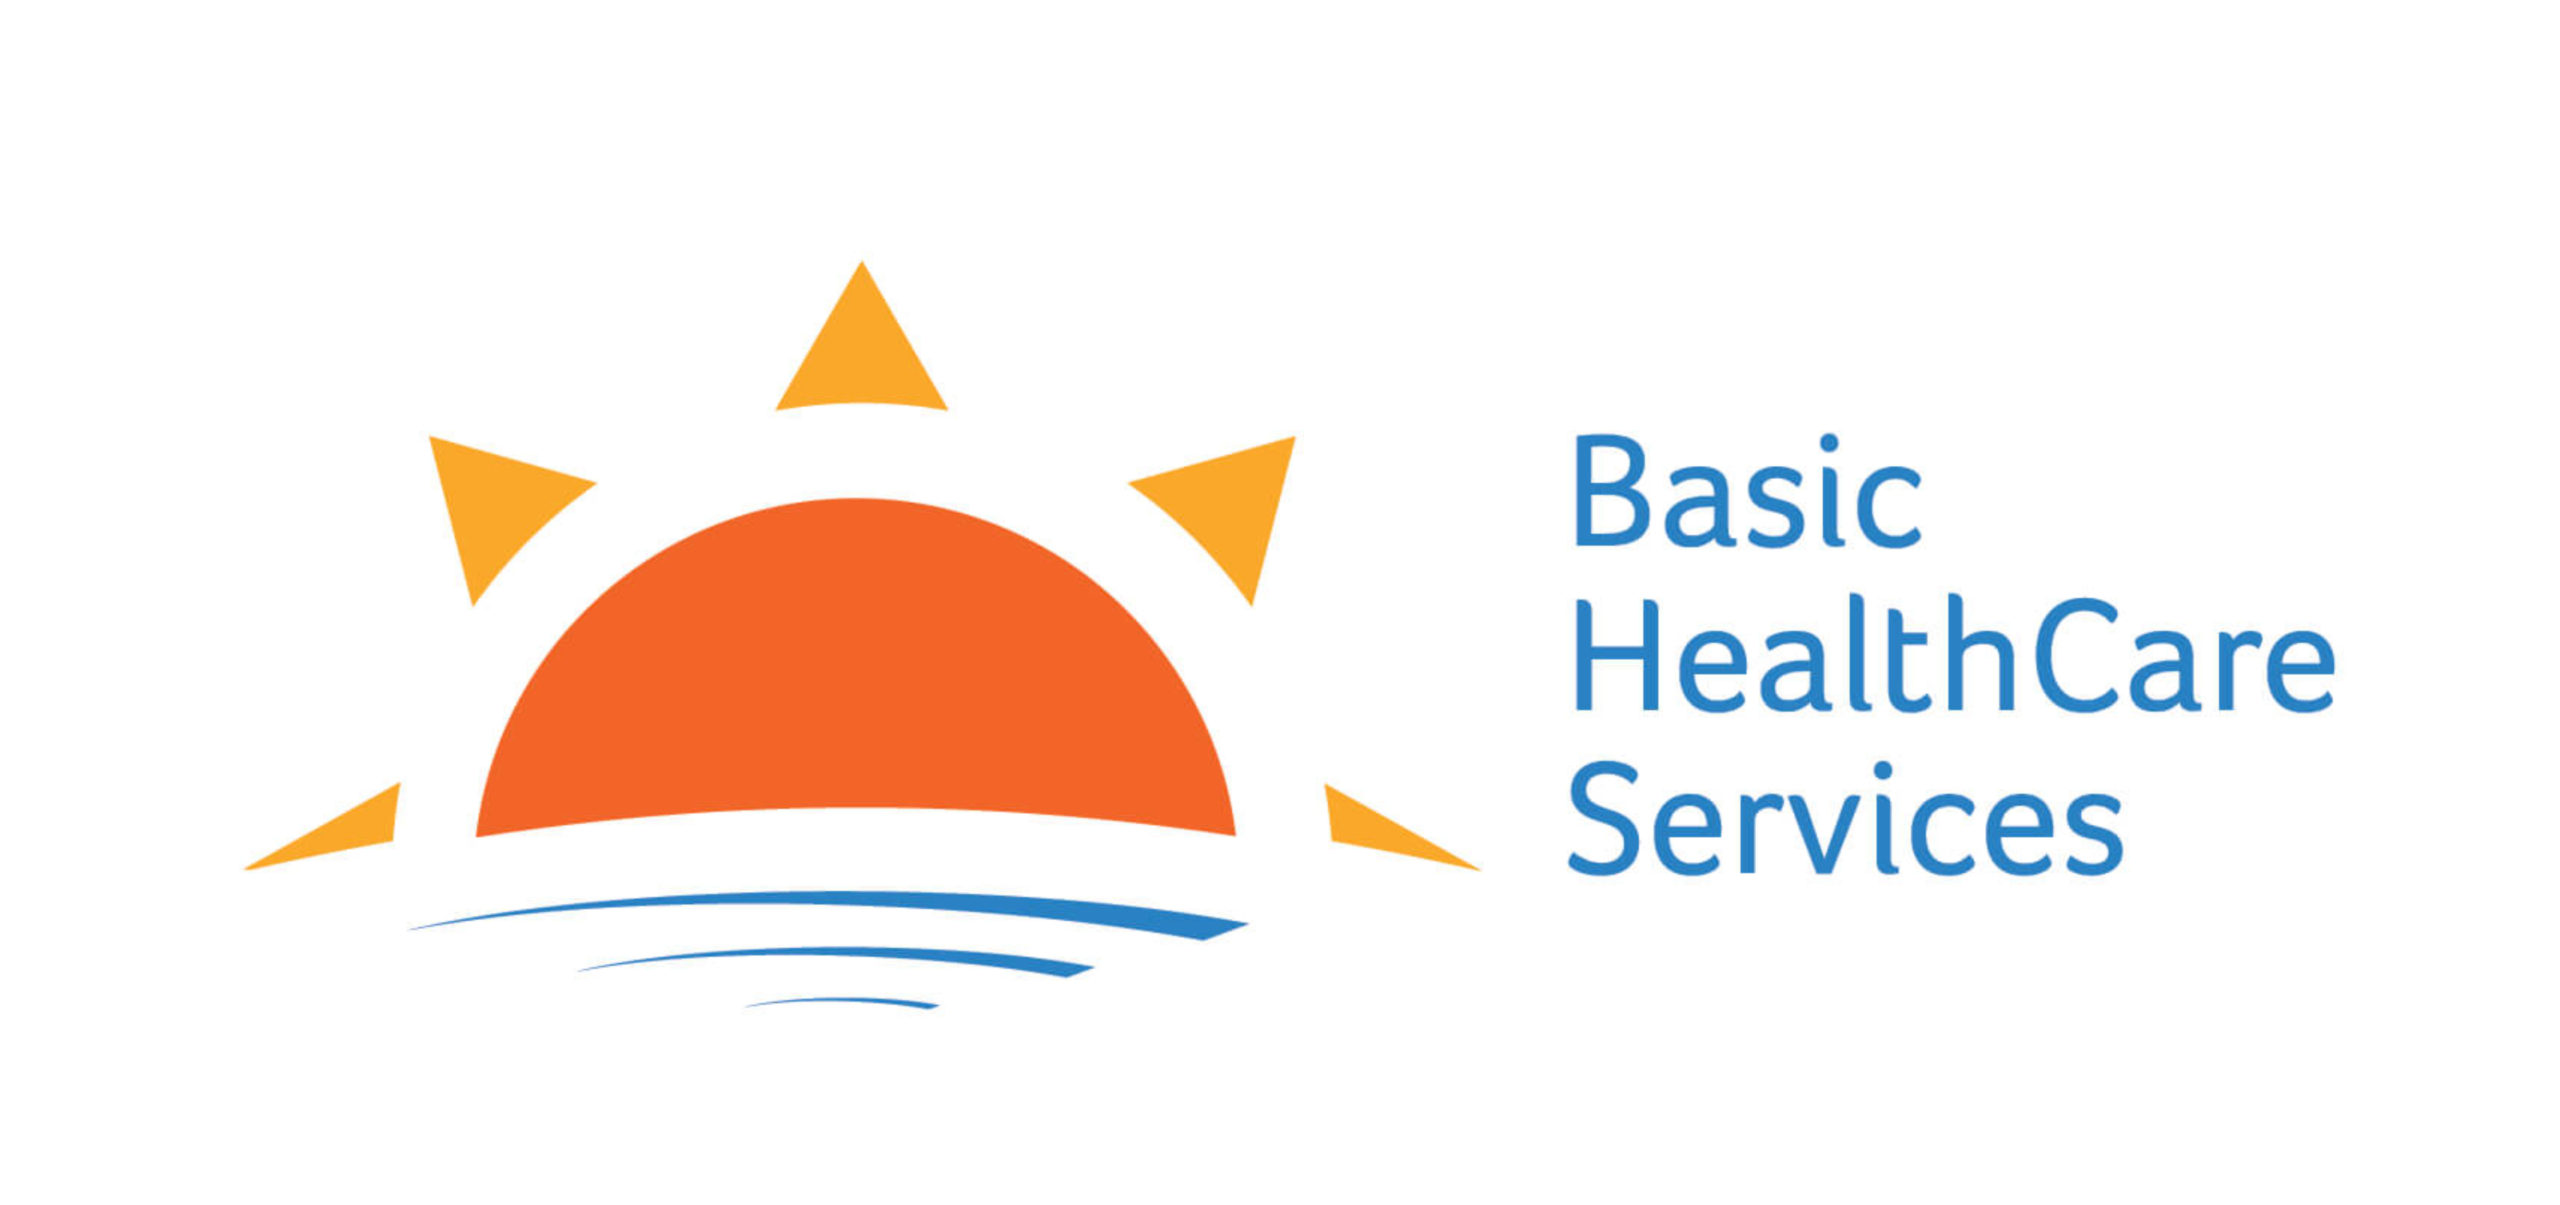 Basic HealthCare Services (BHS)